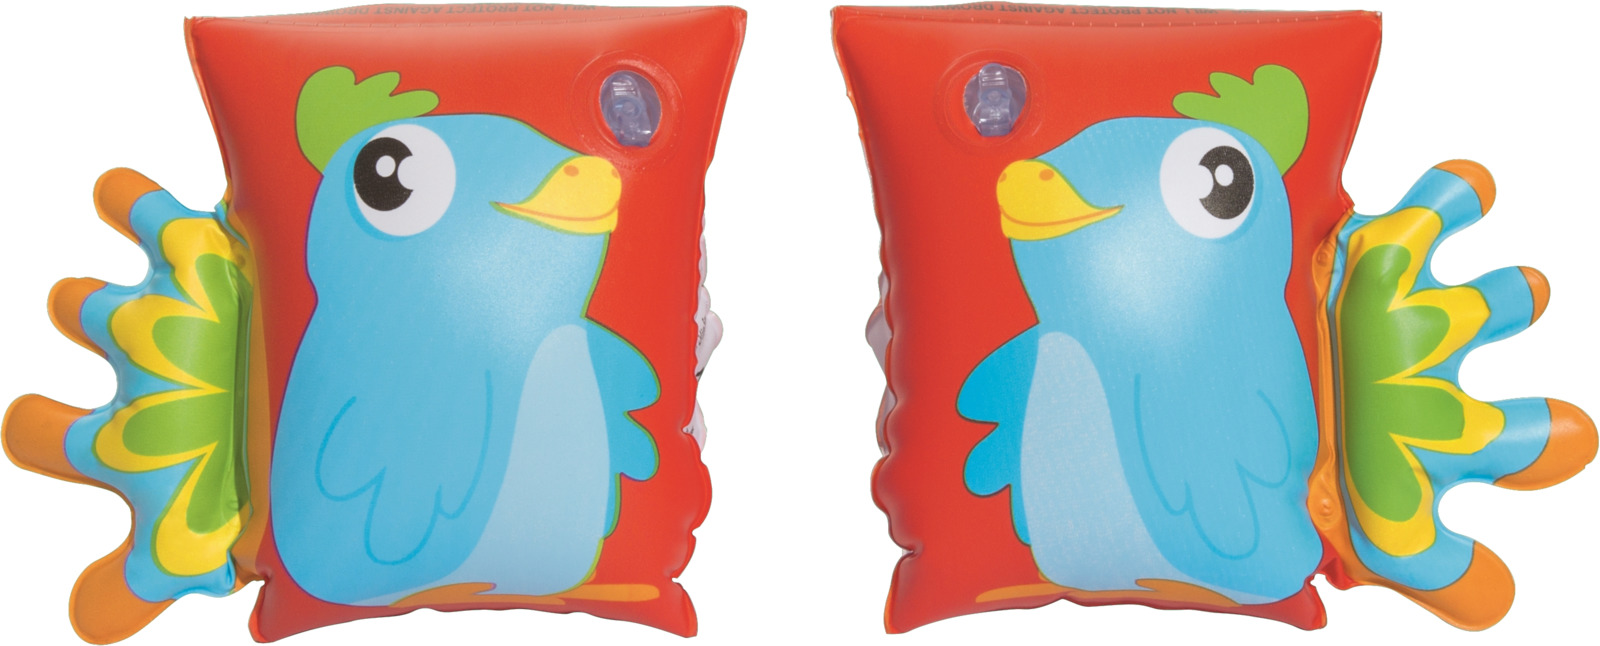 цена на Bestway Нарукавники для плавания Попугаи